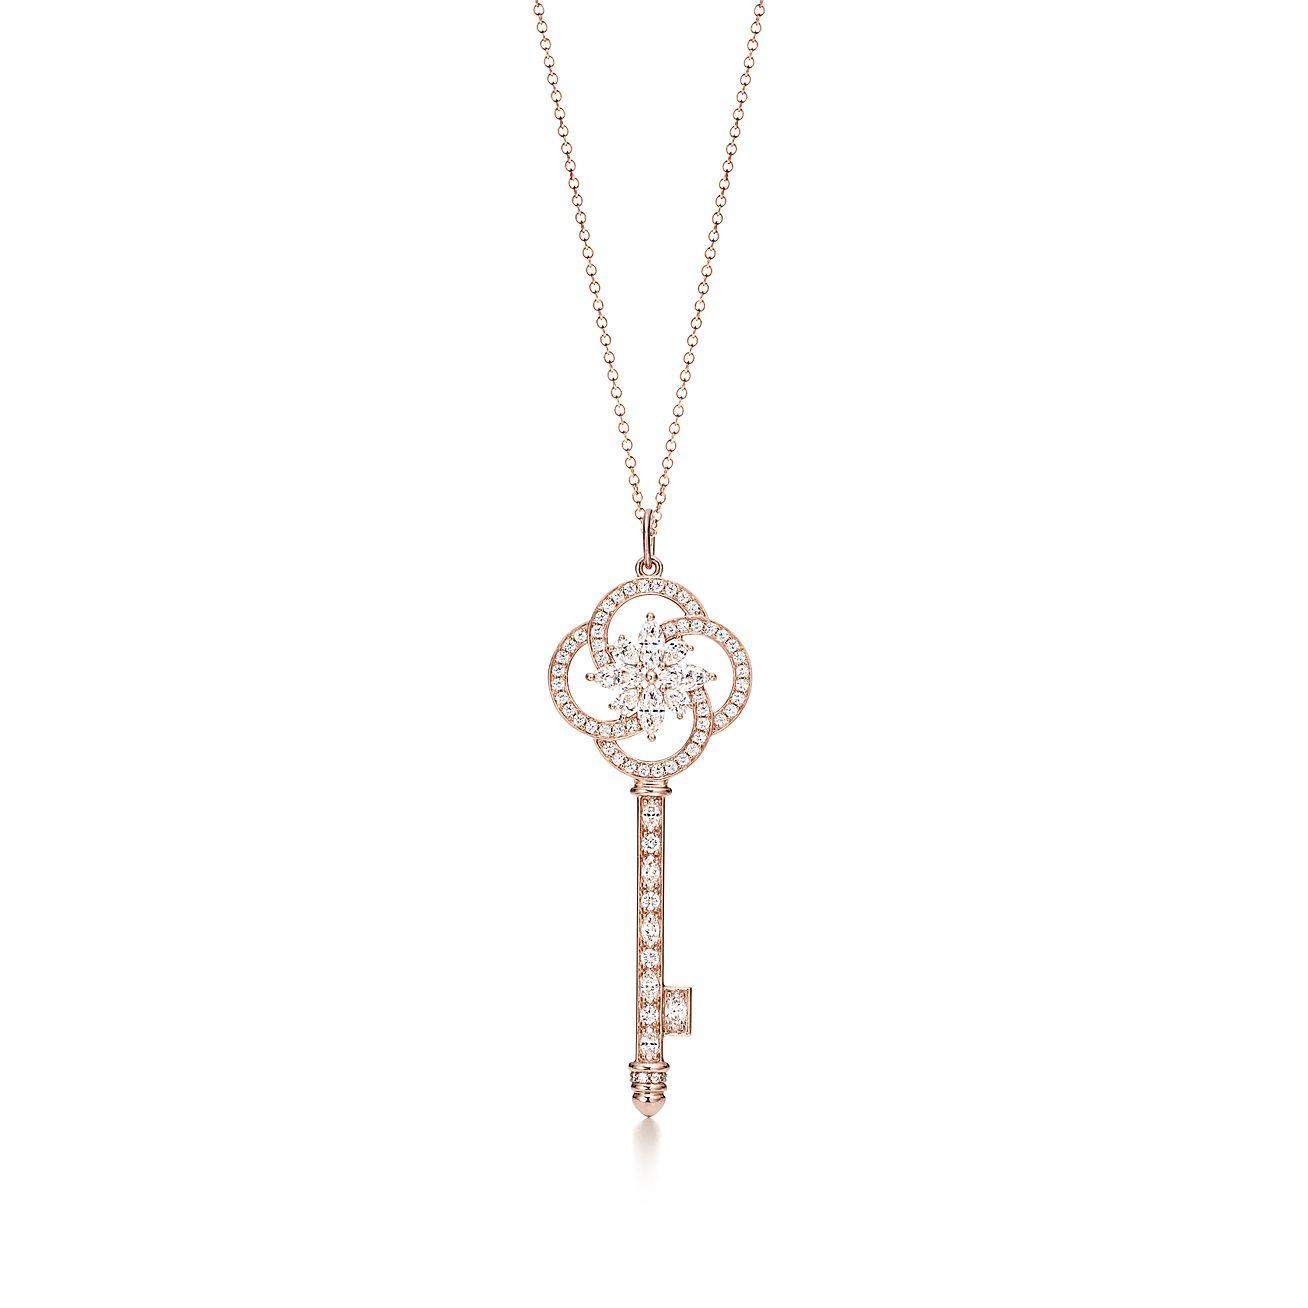 Tiffany Keys floral key pendant in 18k white gold with diamonds Tiffany & Co.